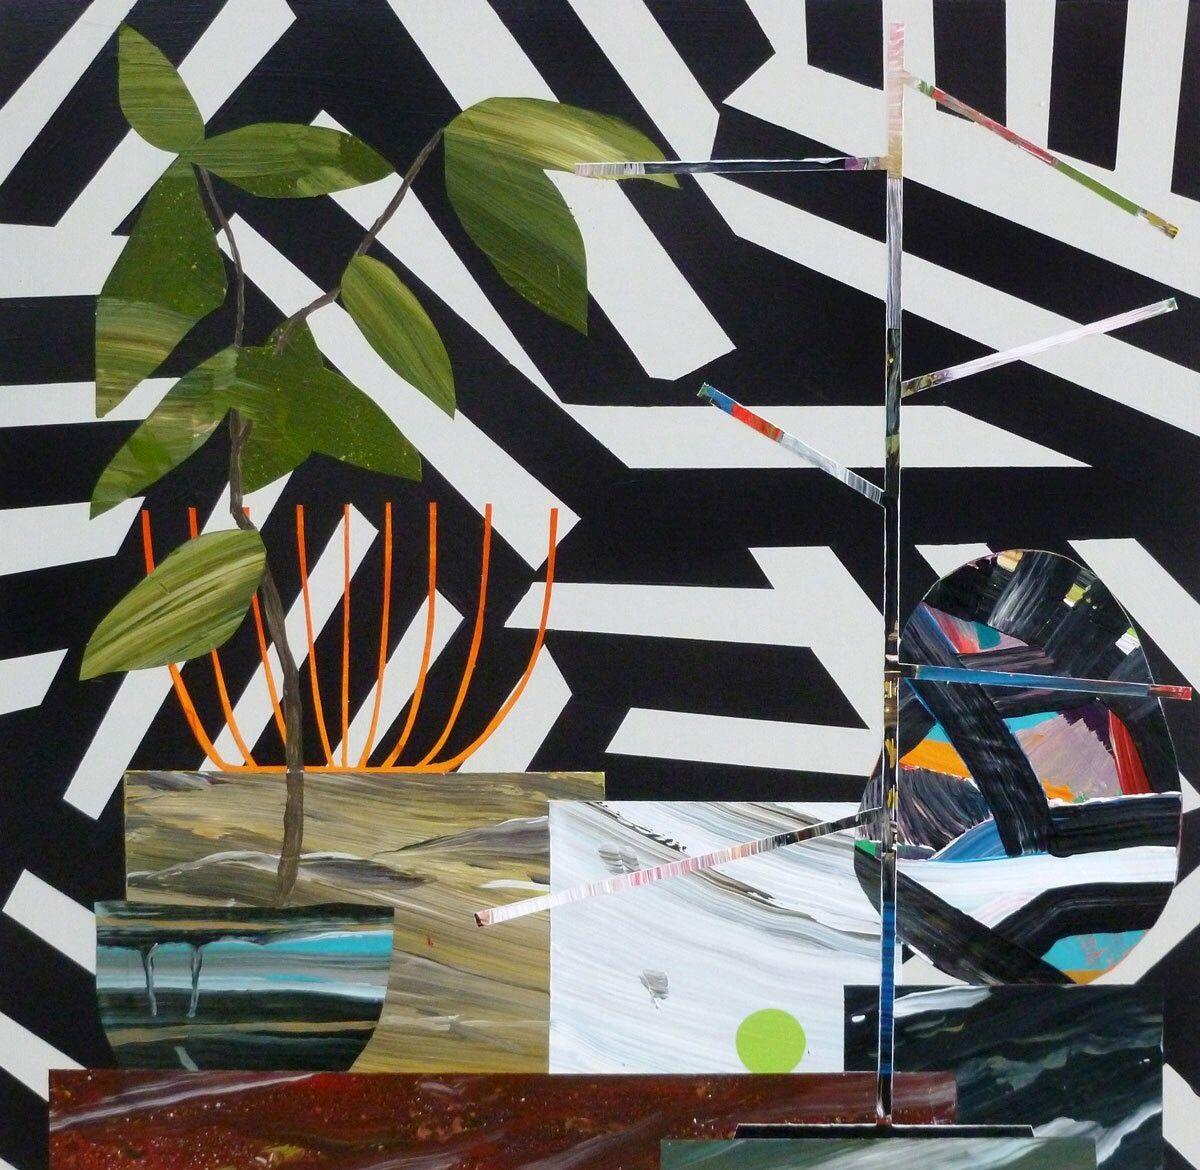 The Plant-Filled Freak Folk Paintings of Paul Wackers